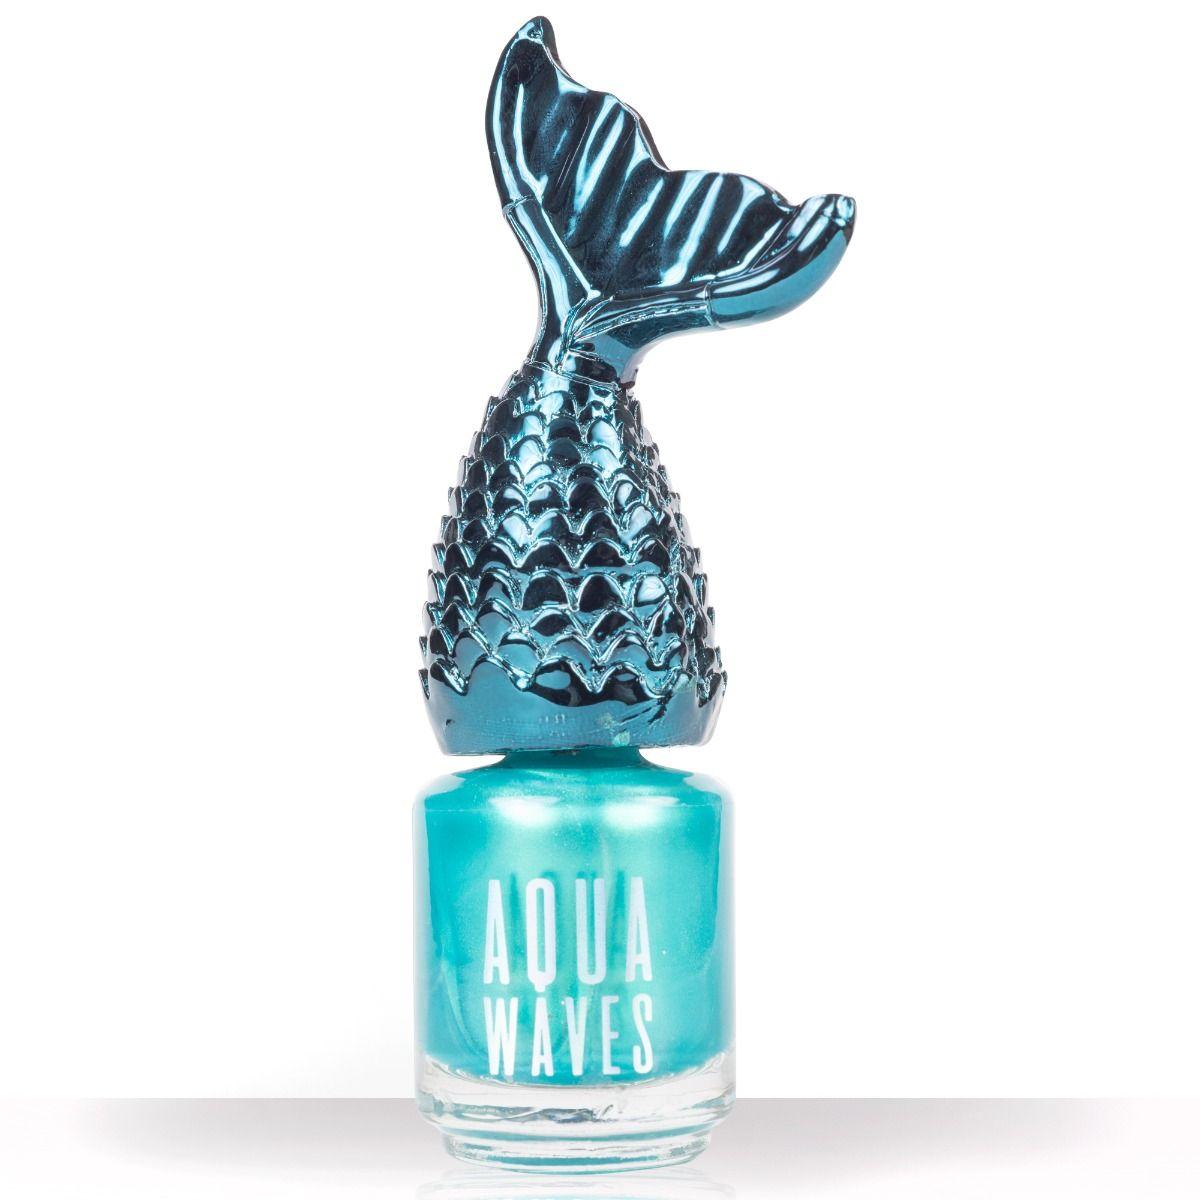 Blue Mermaid Tail Nail Polish | Aqua Waves Nail Polish by NPW | Fin Fun